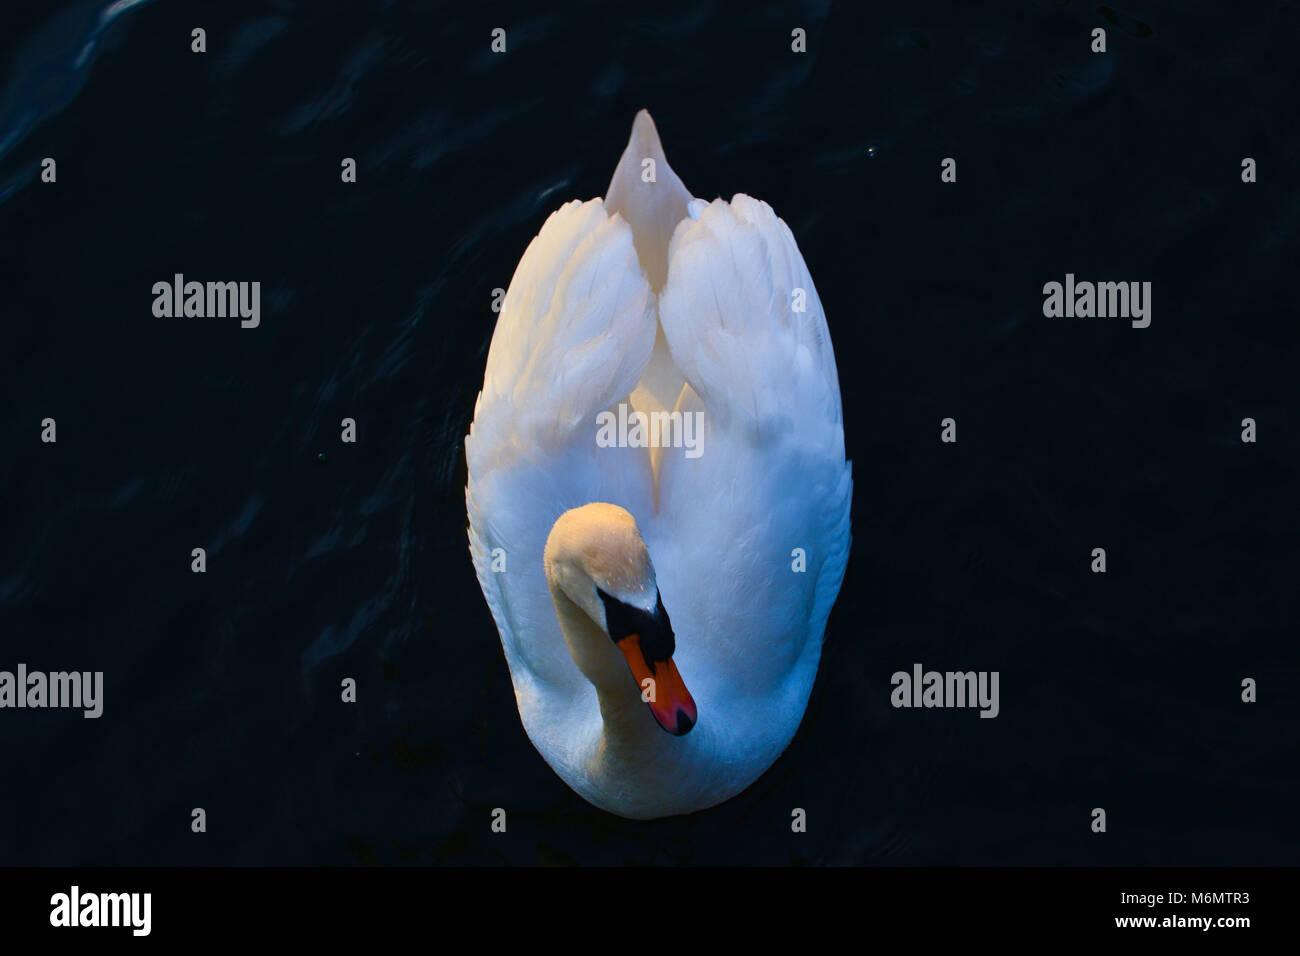 White Swan Swimming Swan in Breda, Netherlands - Stock Image